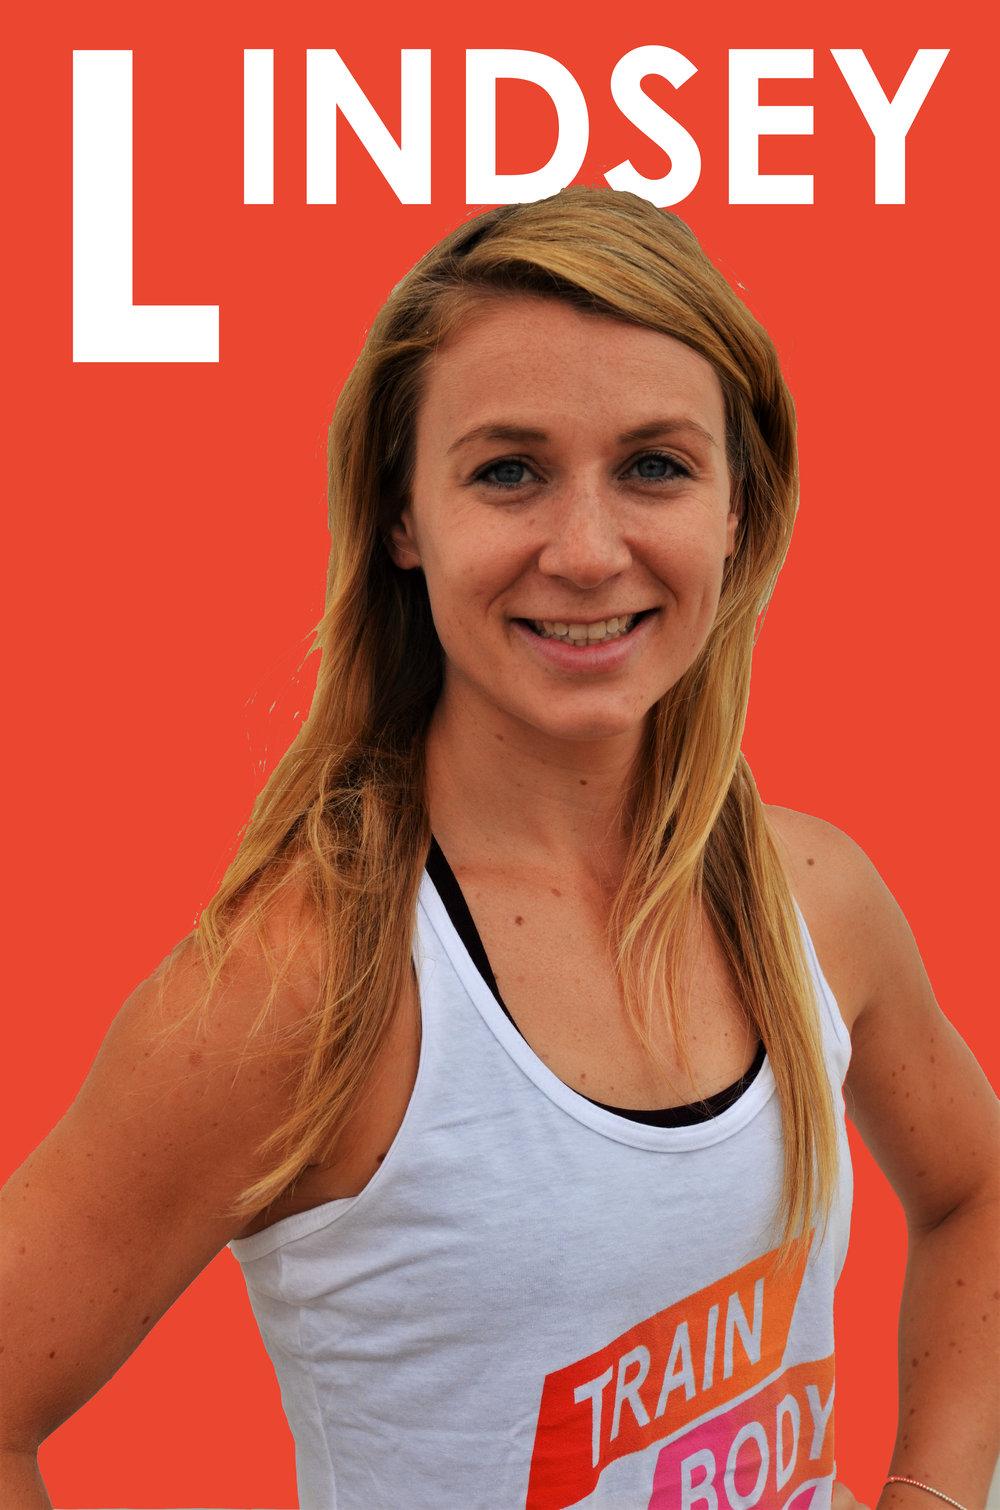 Lyndsey Pryor, trainer